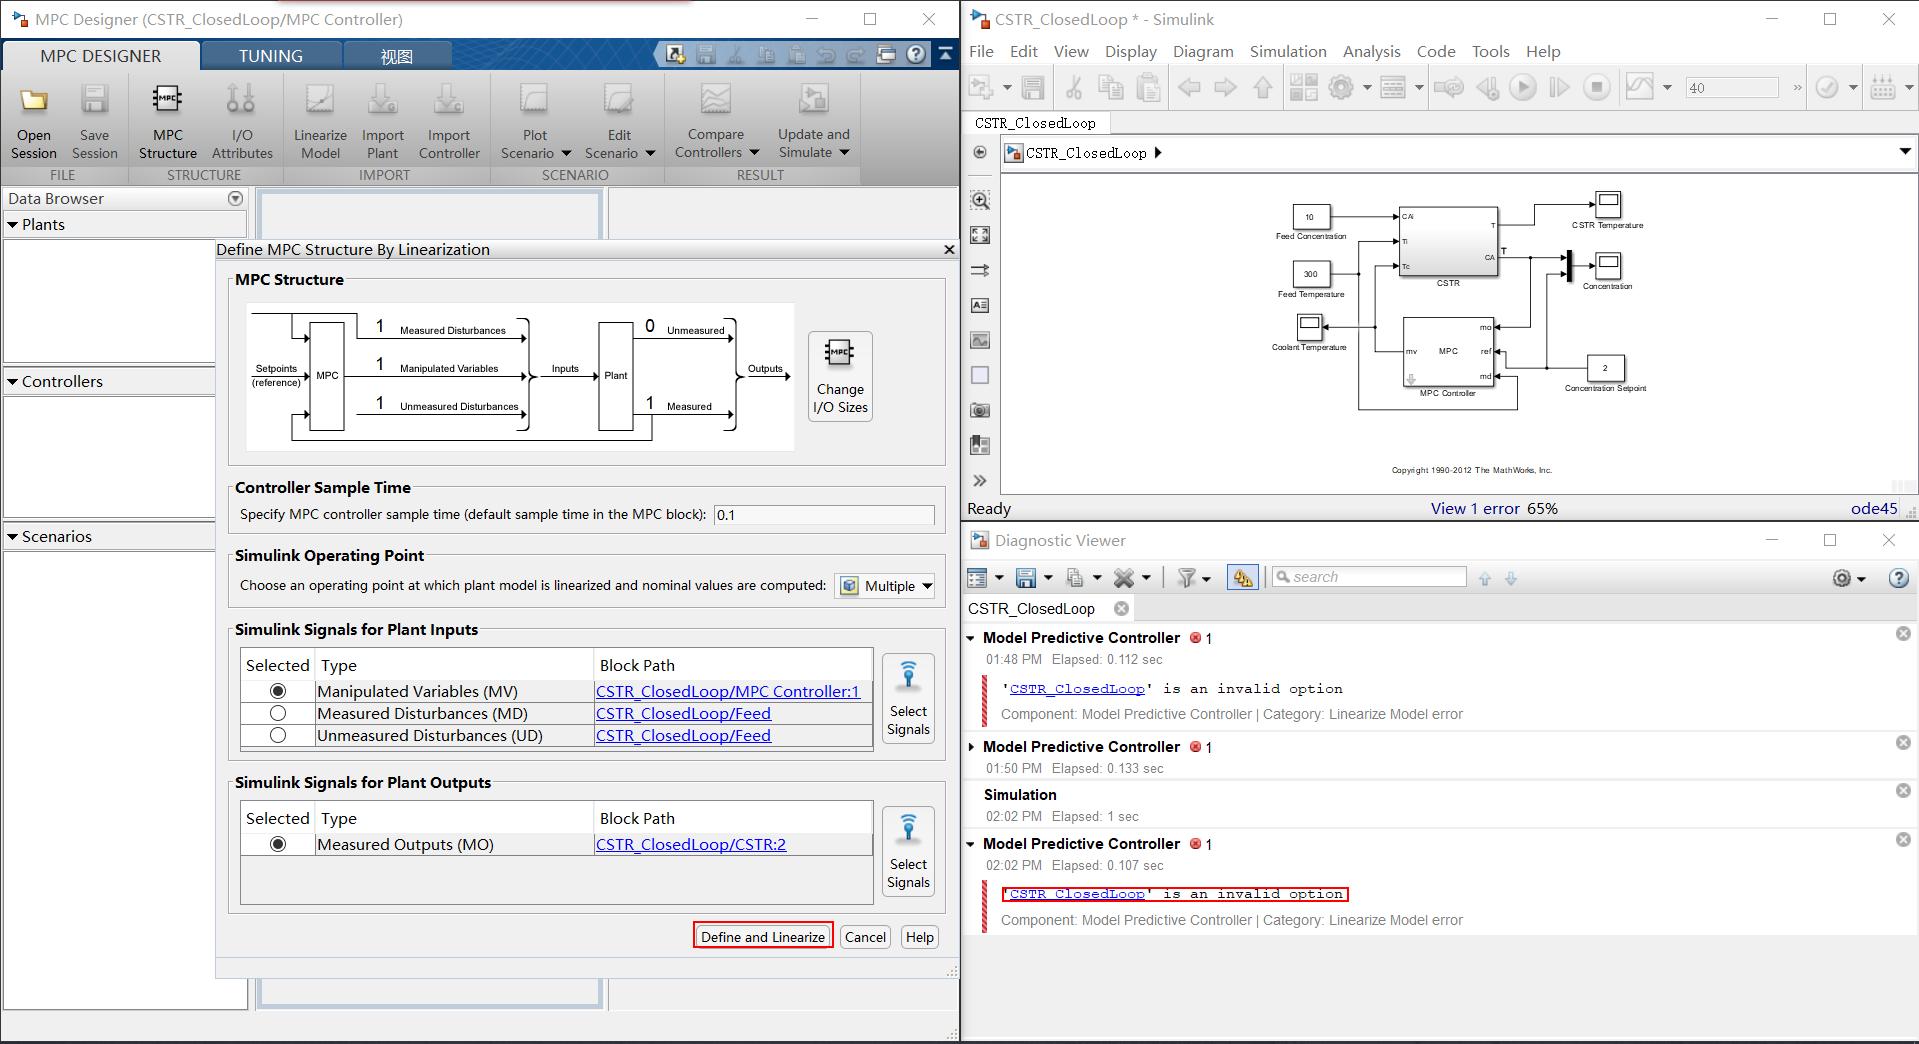 mpc toolbox problem: \'CSTR_ClosedLoop\' is an invalid option - MATLAB ...